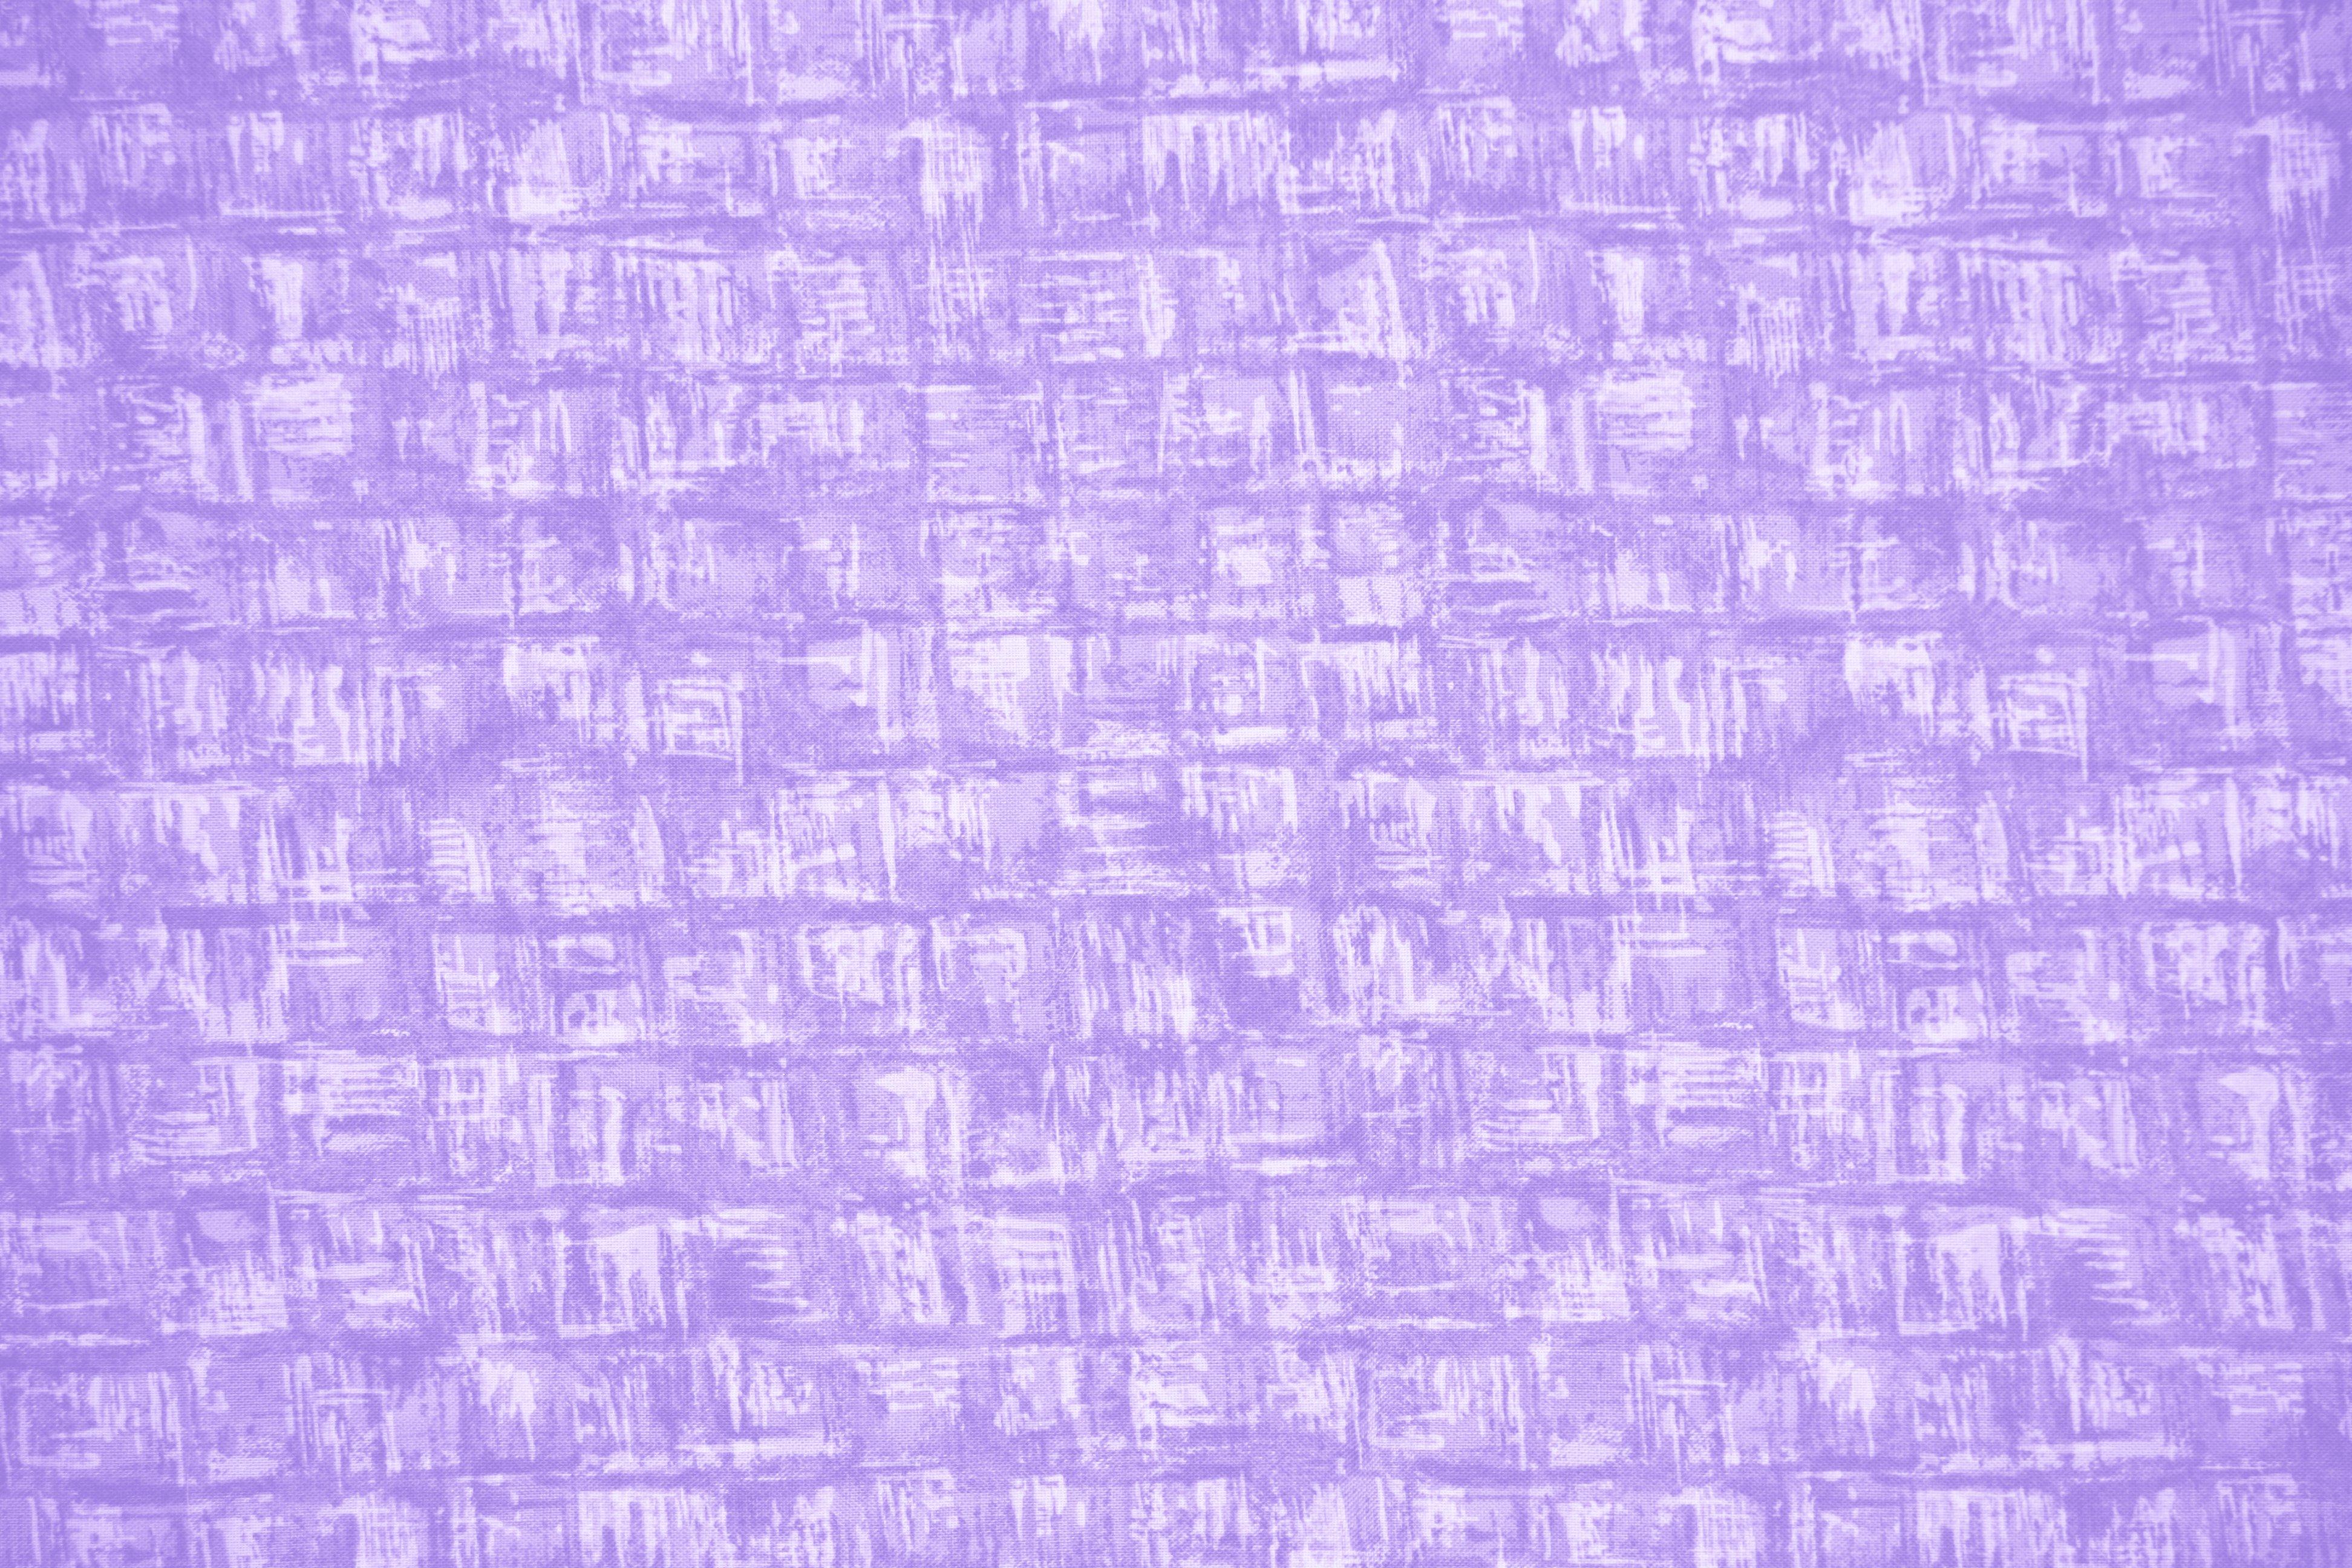 Abstract in Lavender Glass by StarwaltDesign on DeviantArt